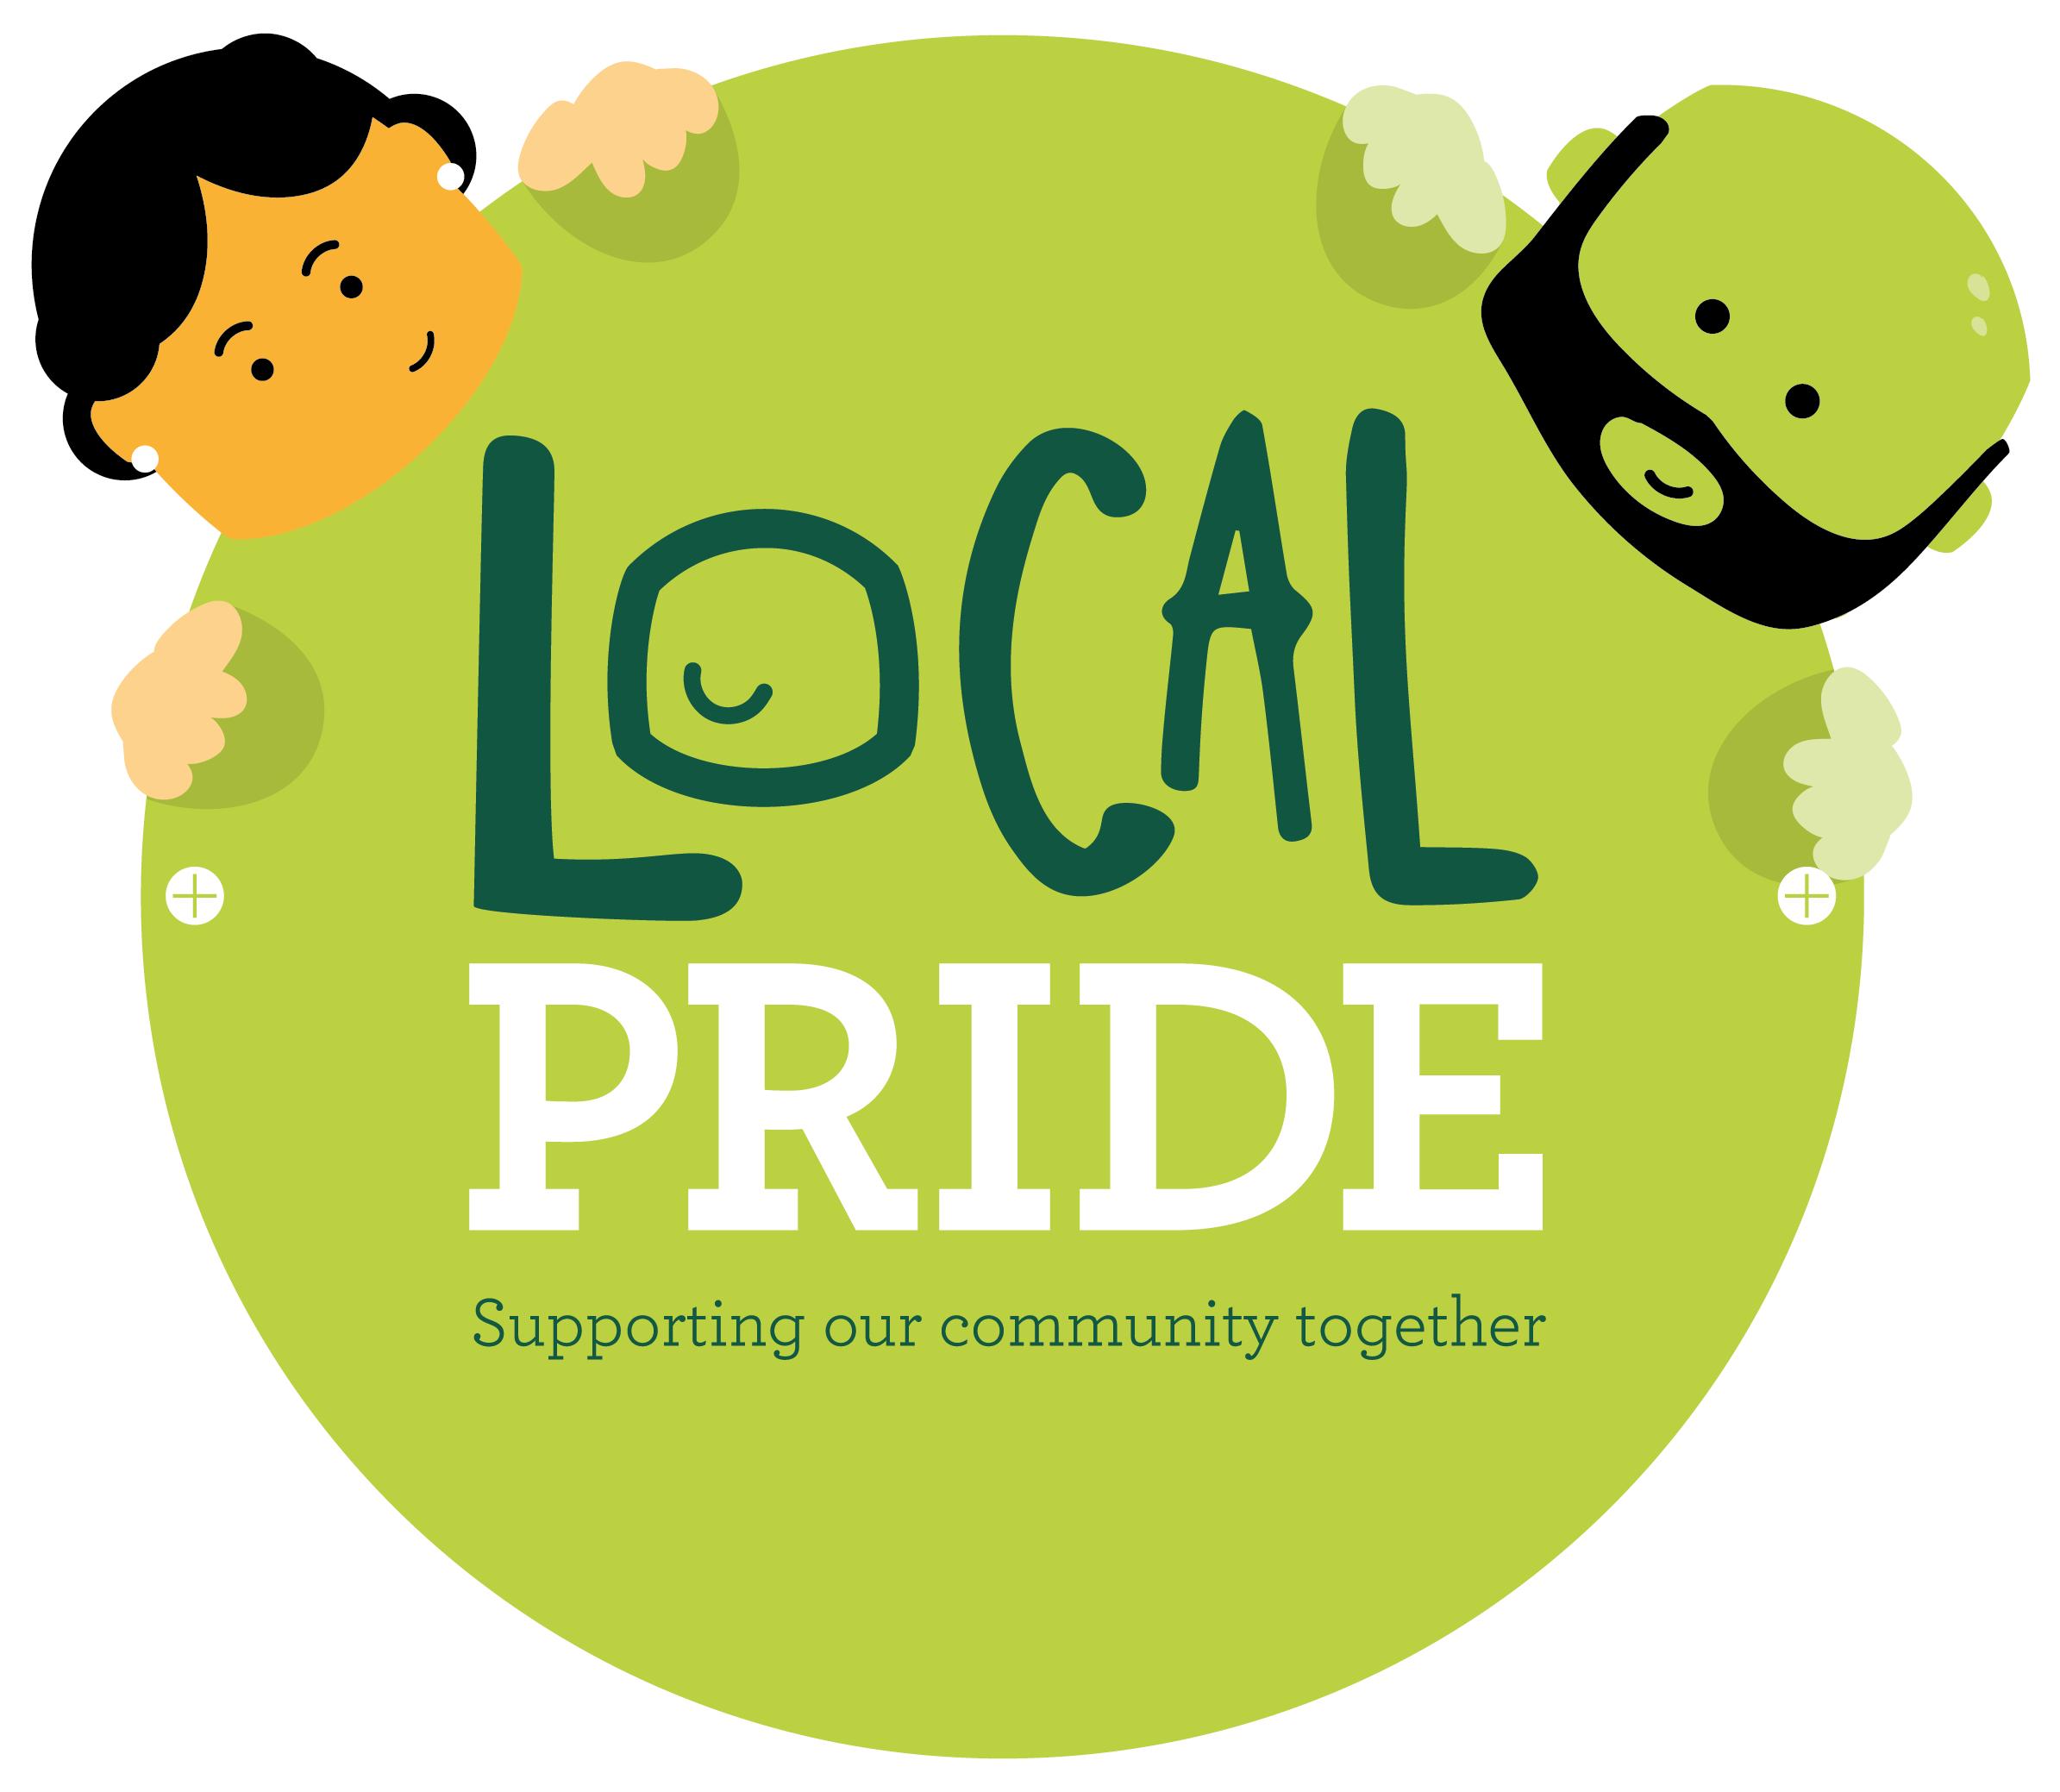 Local pride online fundraising. Fundraiser clipart 100 square